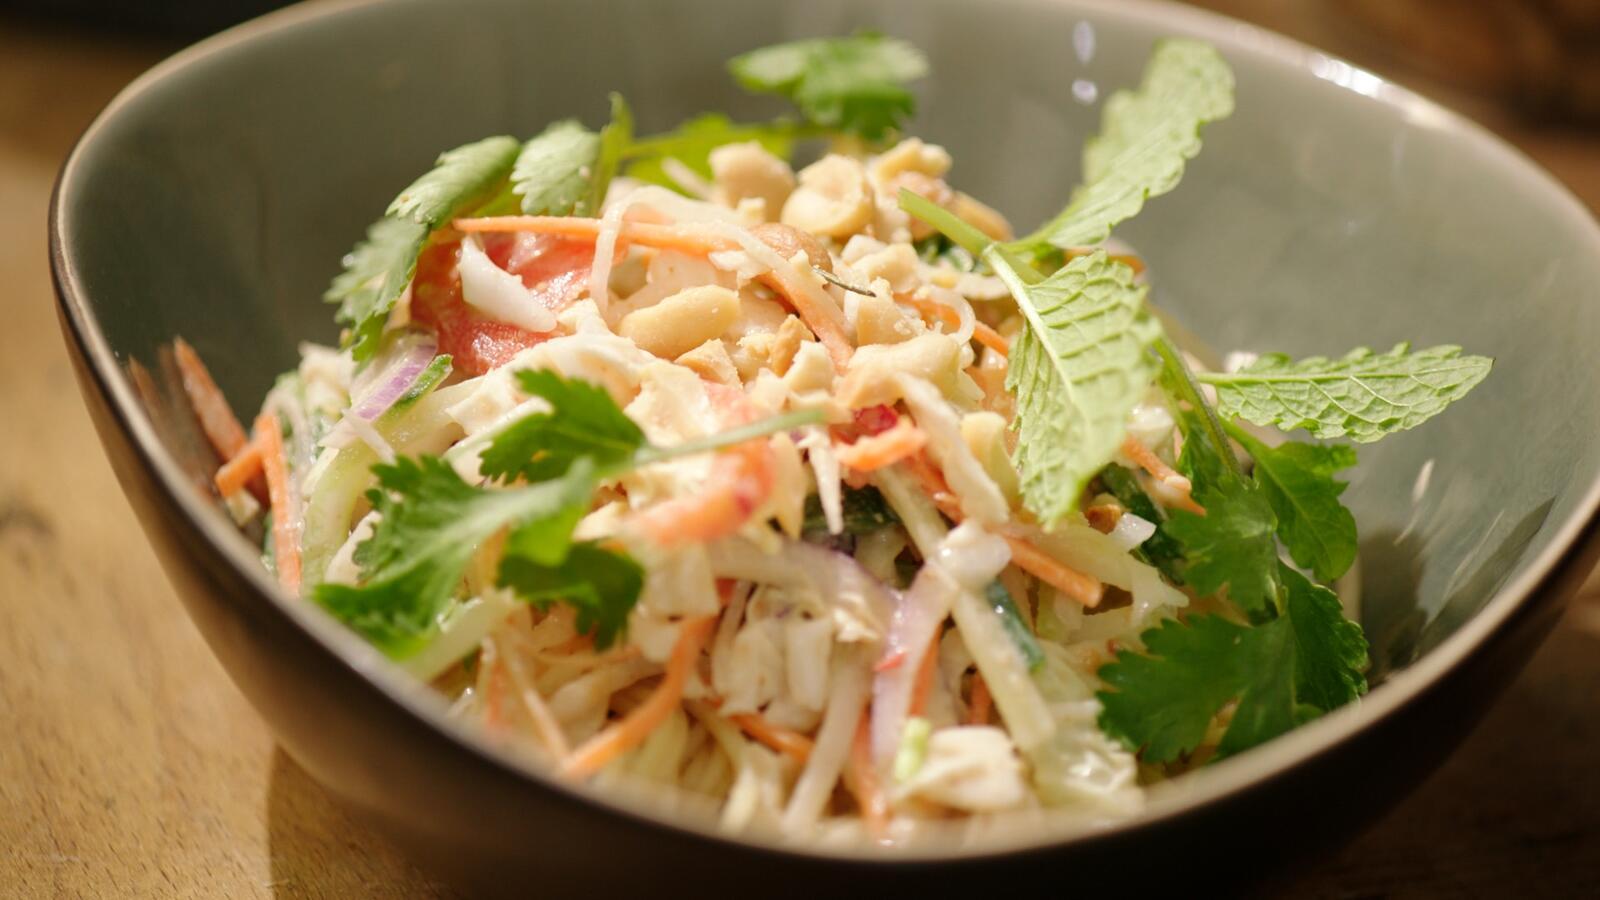 Thaise groentesalade met pindadressing